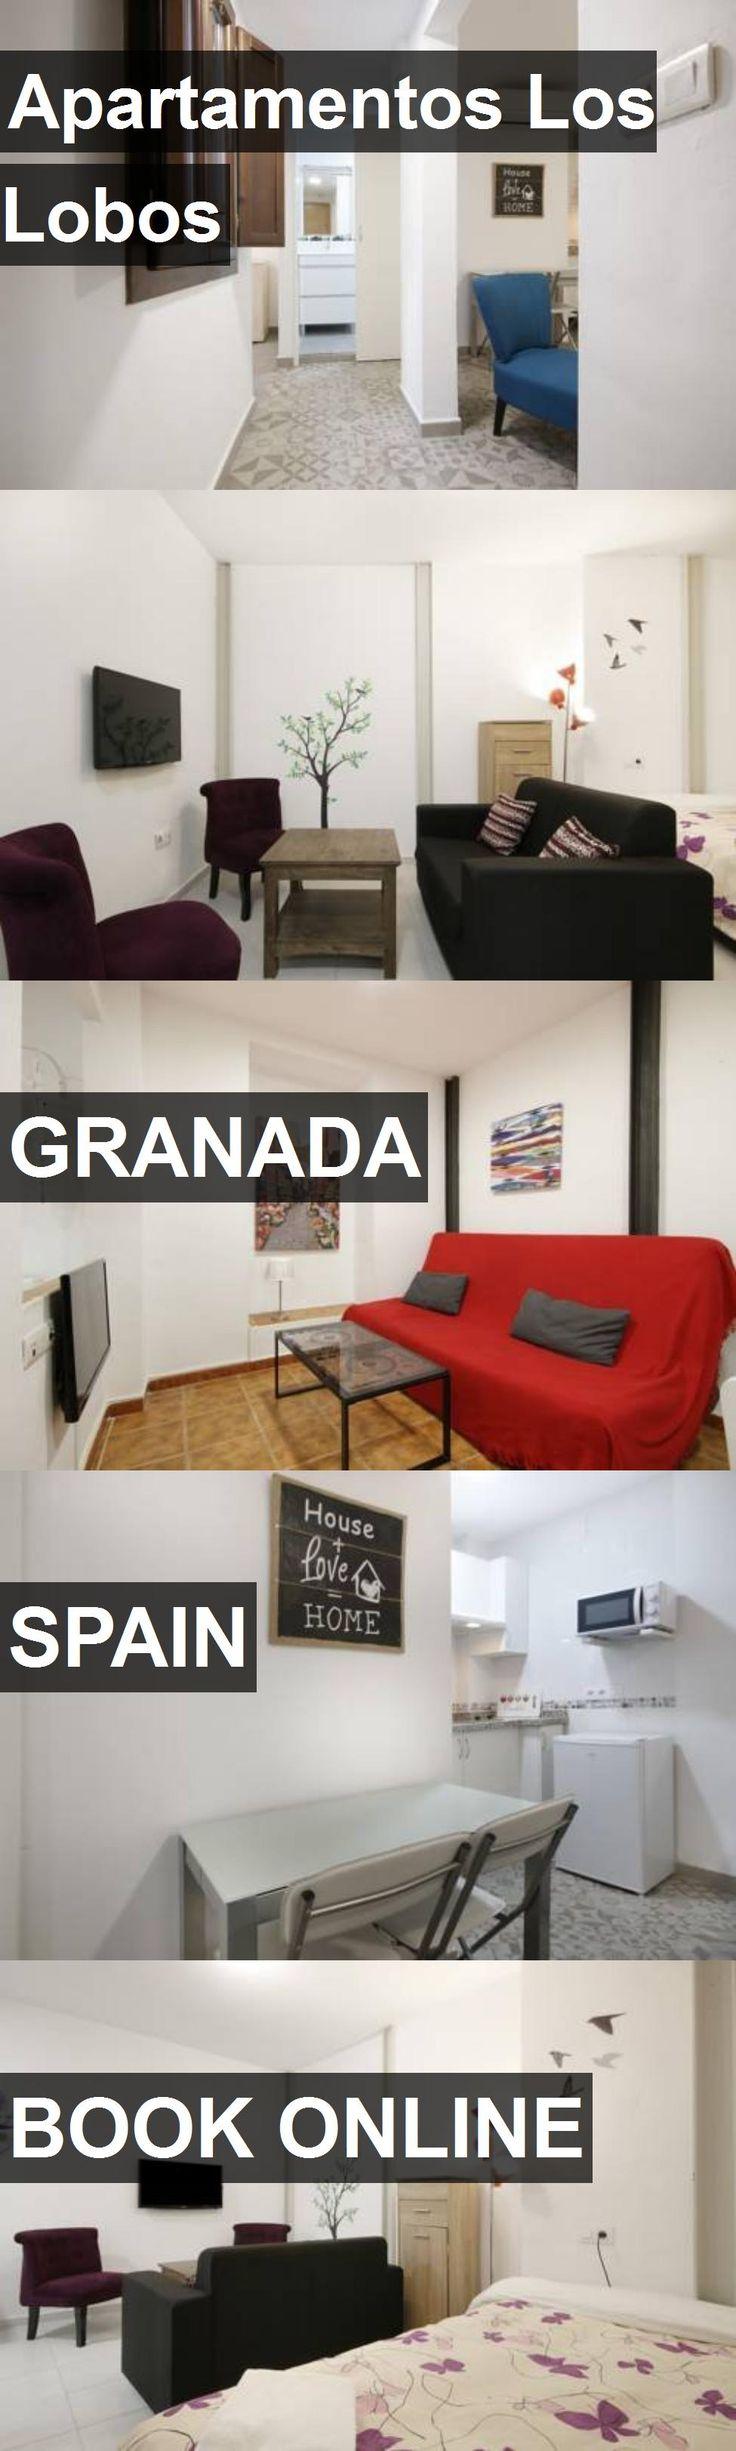 Hotel Apartamentos Los Lobos in Granada, Spain. For more information, photos, reviews and best prices please follow the link. #Spain #Granada #travel #vacation #hotel